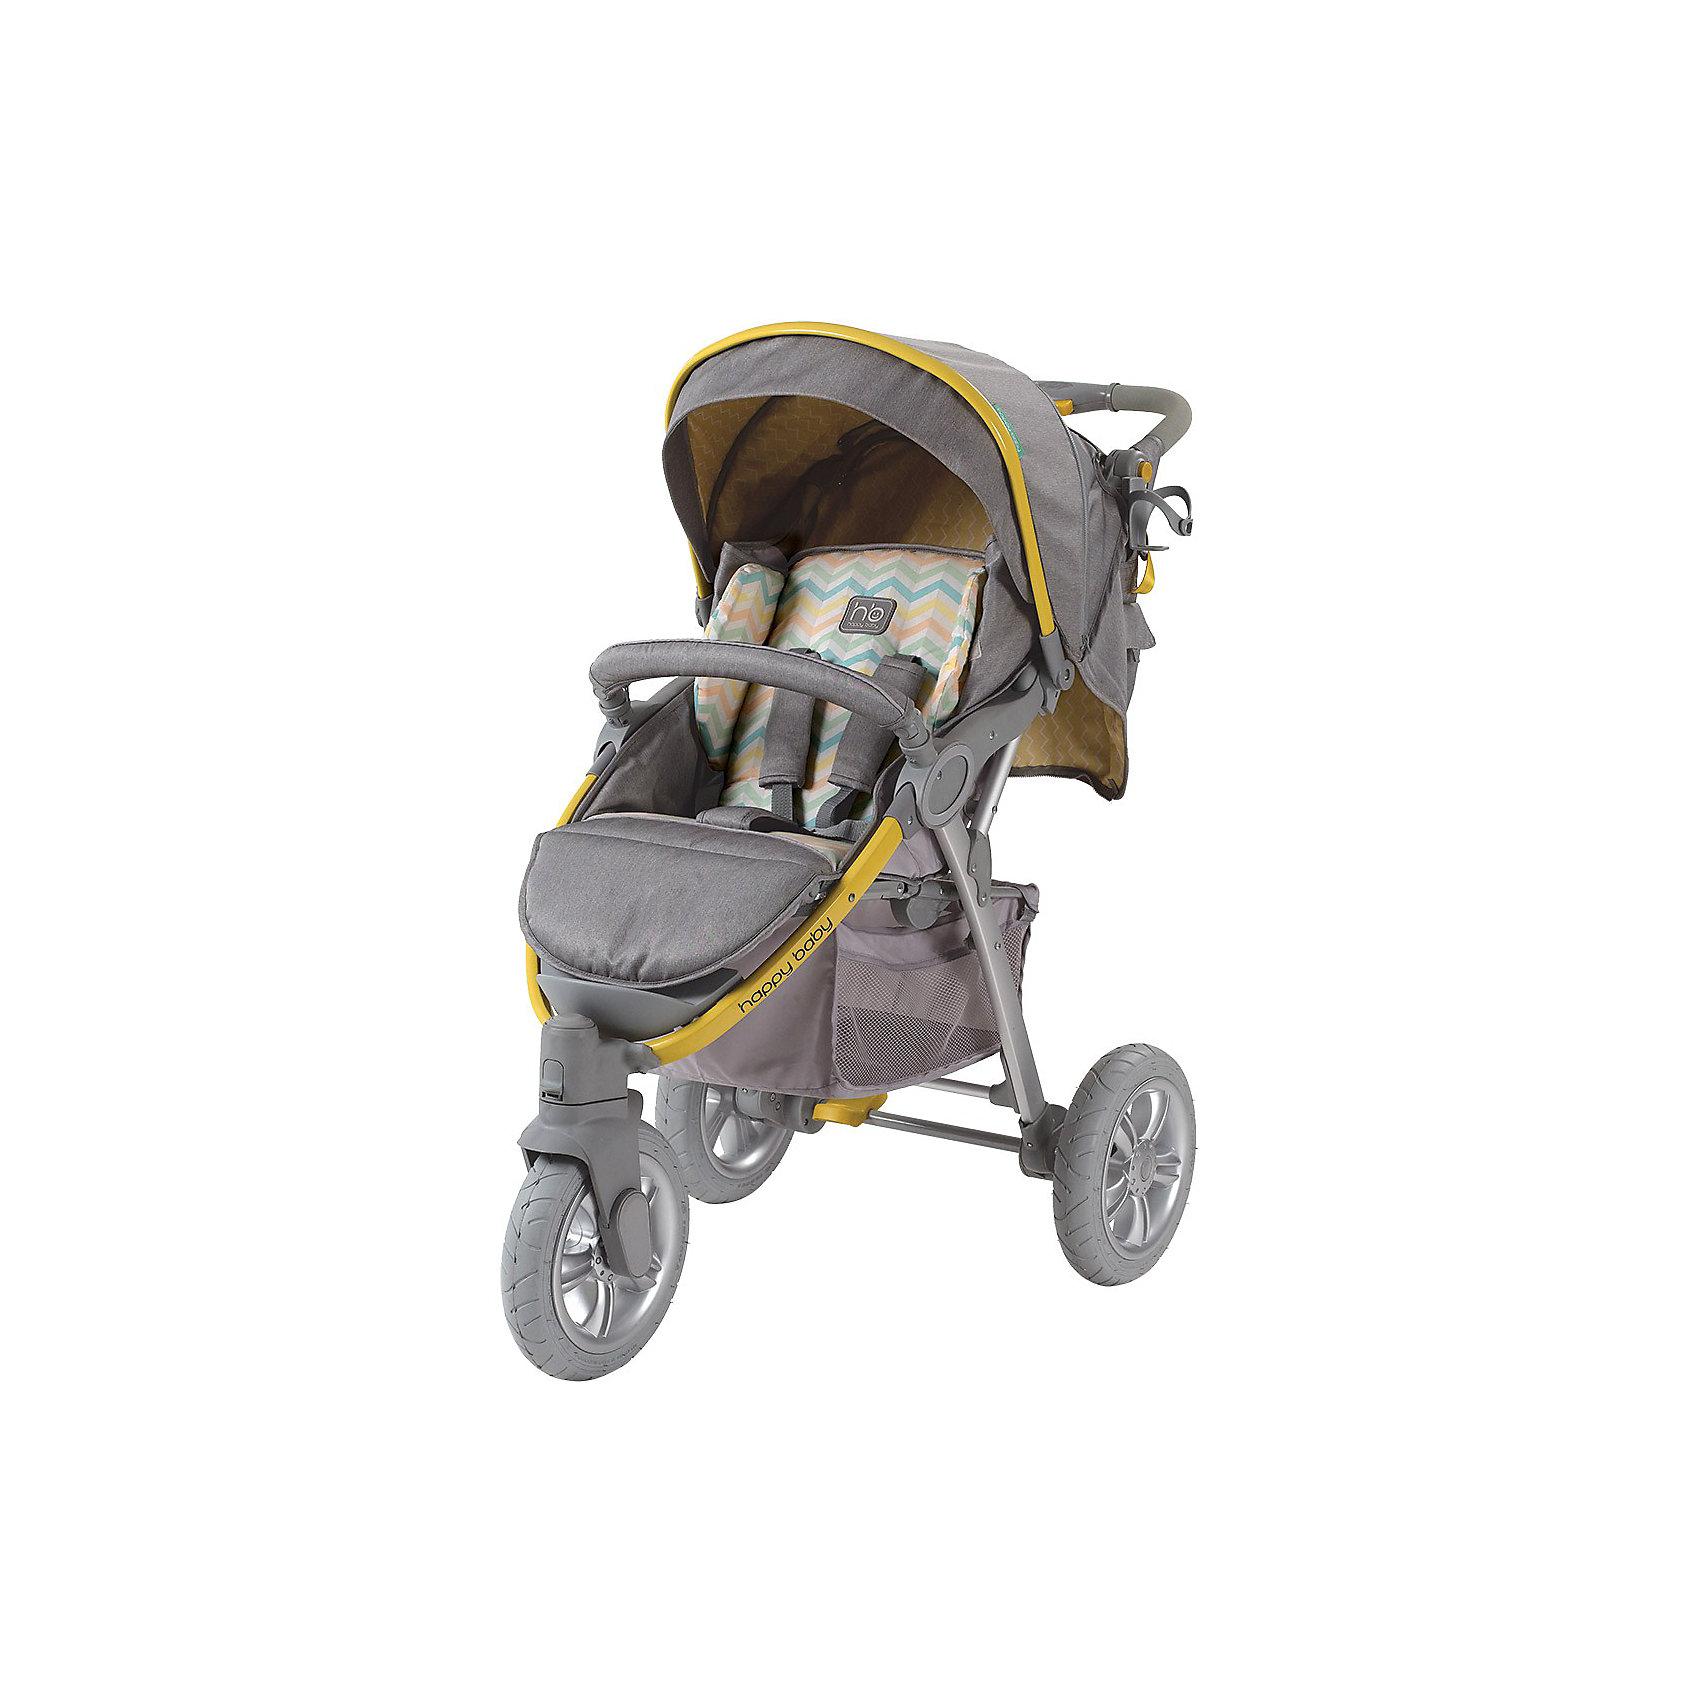 Happy Baby Прогулочная коляска Neon Sport, Happy Baby, серый/жёлтый купить б у бампер крыло переднее левое фара левая для киа спектра в спб